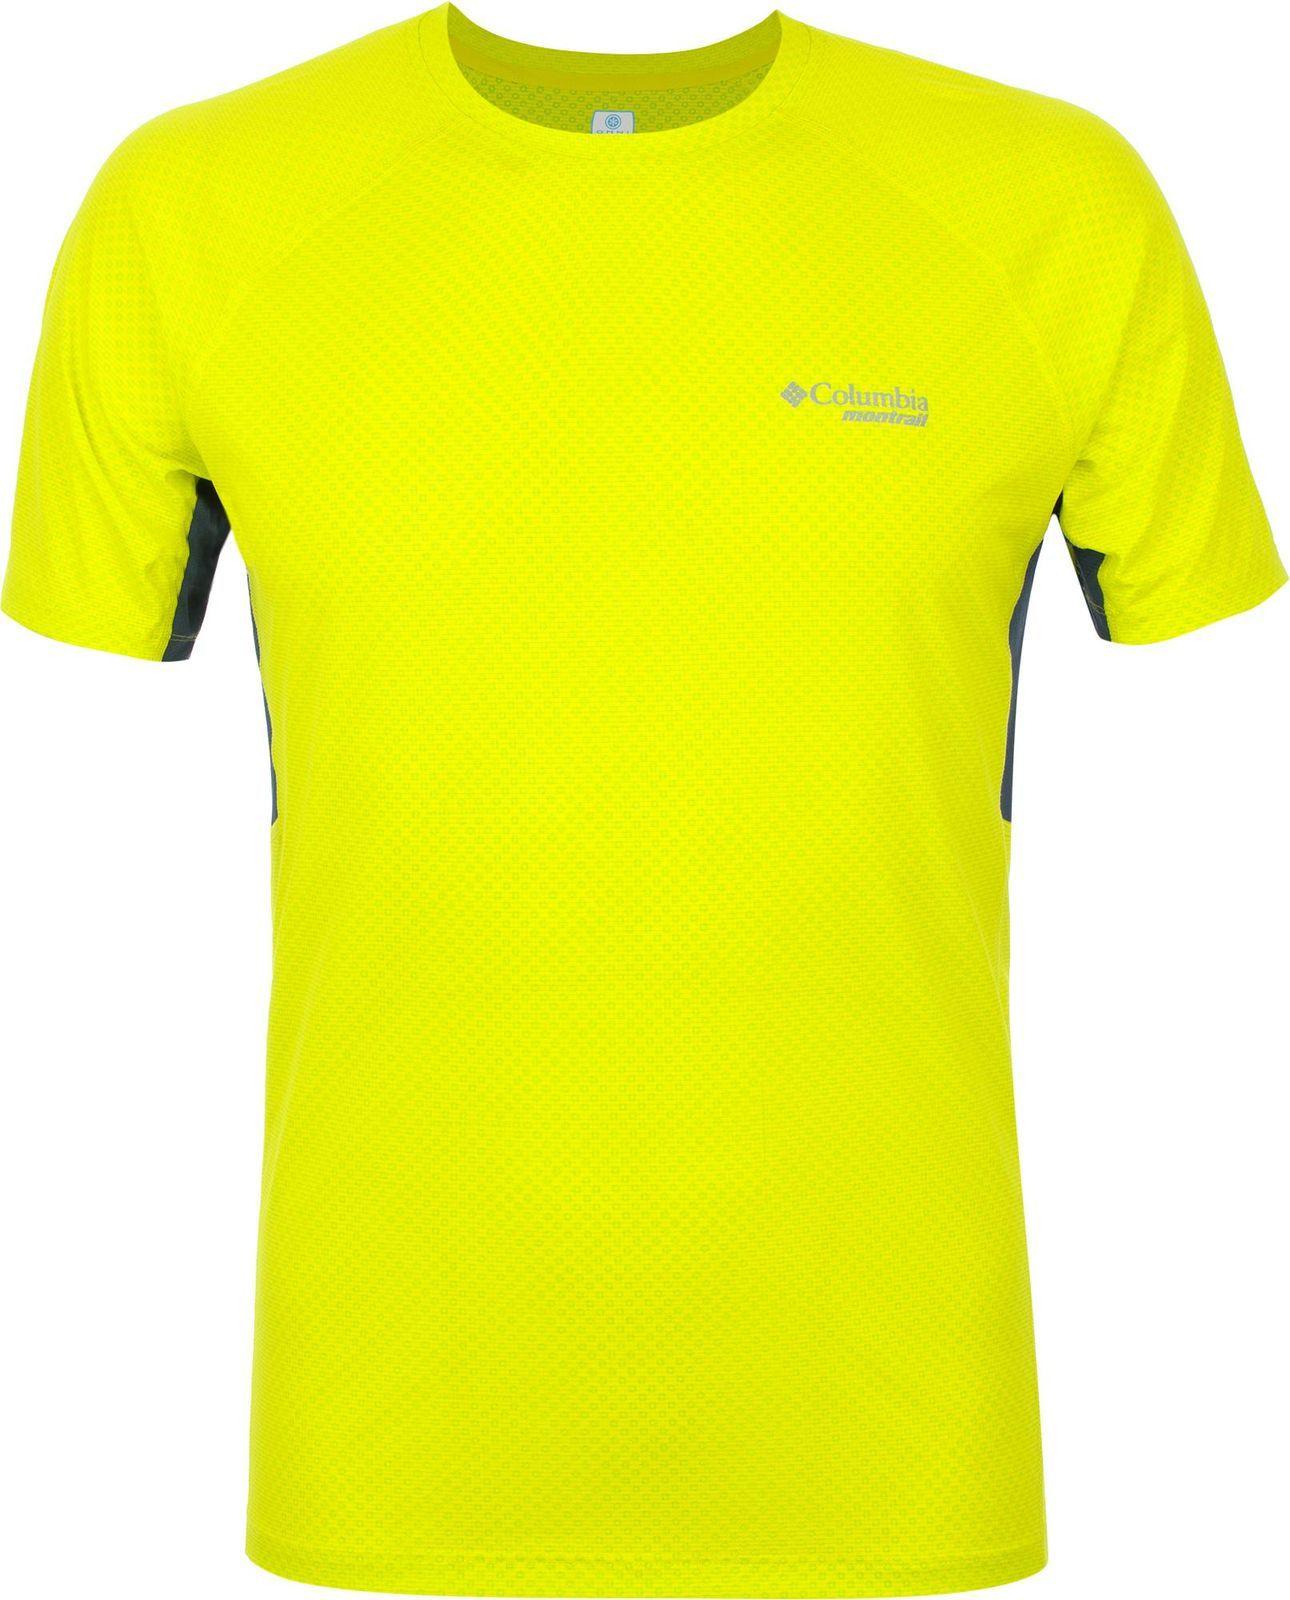 Футболка Columbia Titan Ultra Short Sleeve Shirt roll tab sleeve shirt dress